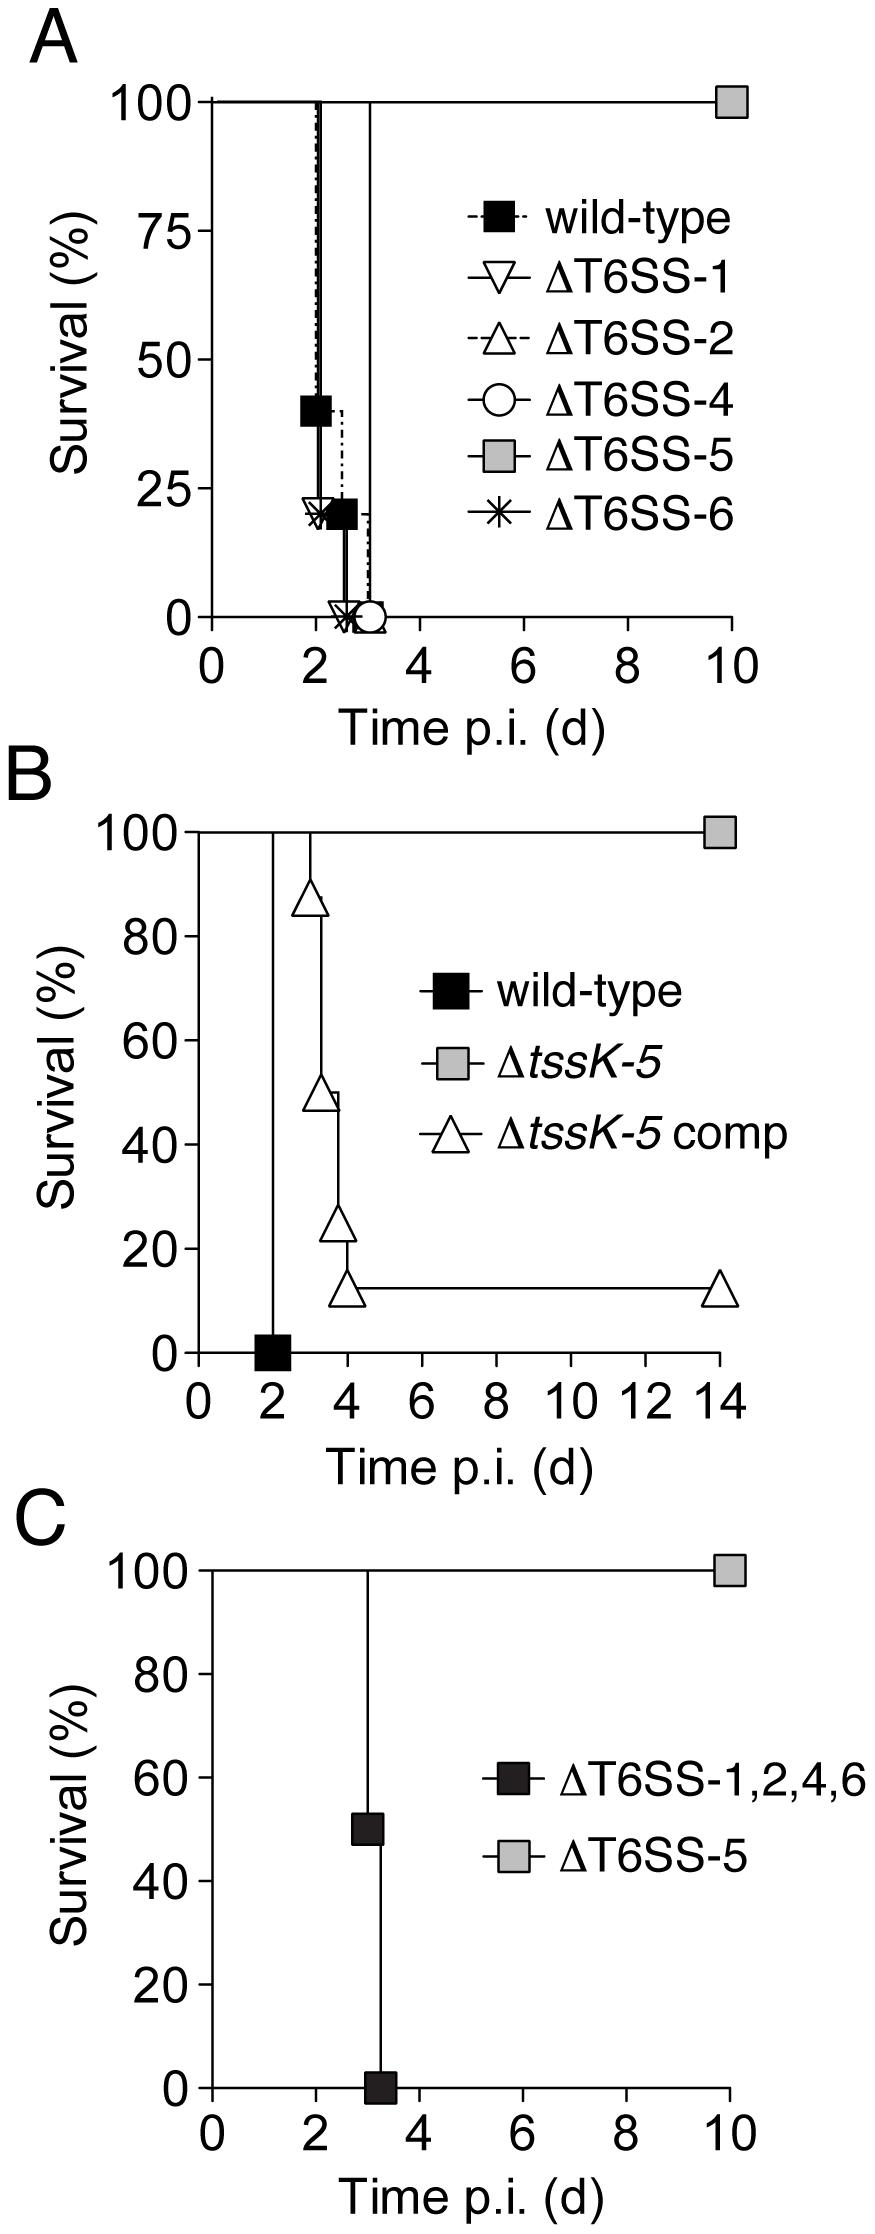 Of the five <i>B. thai</i> T6SSs, only T6SS-5 is required for virulence in a murine acute melioidosis model.